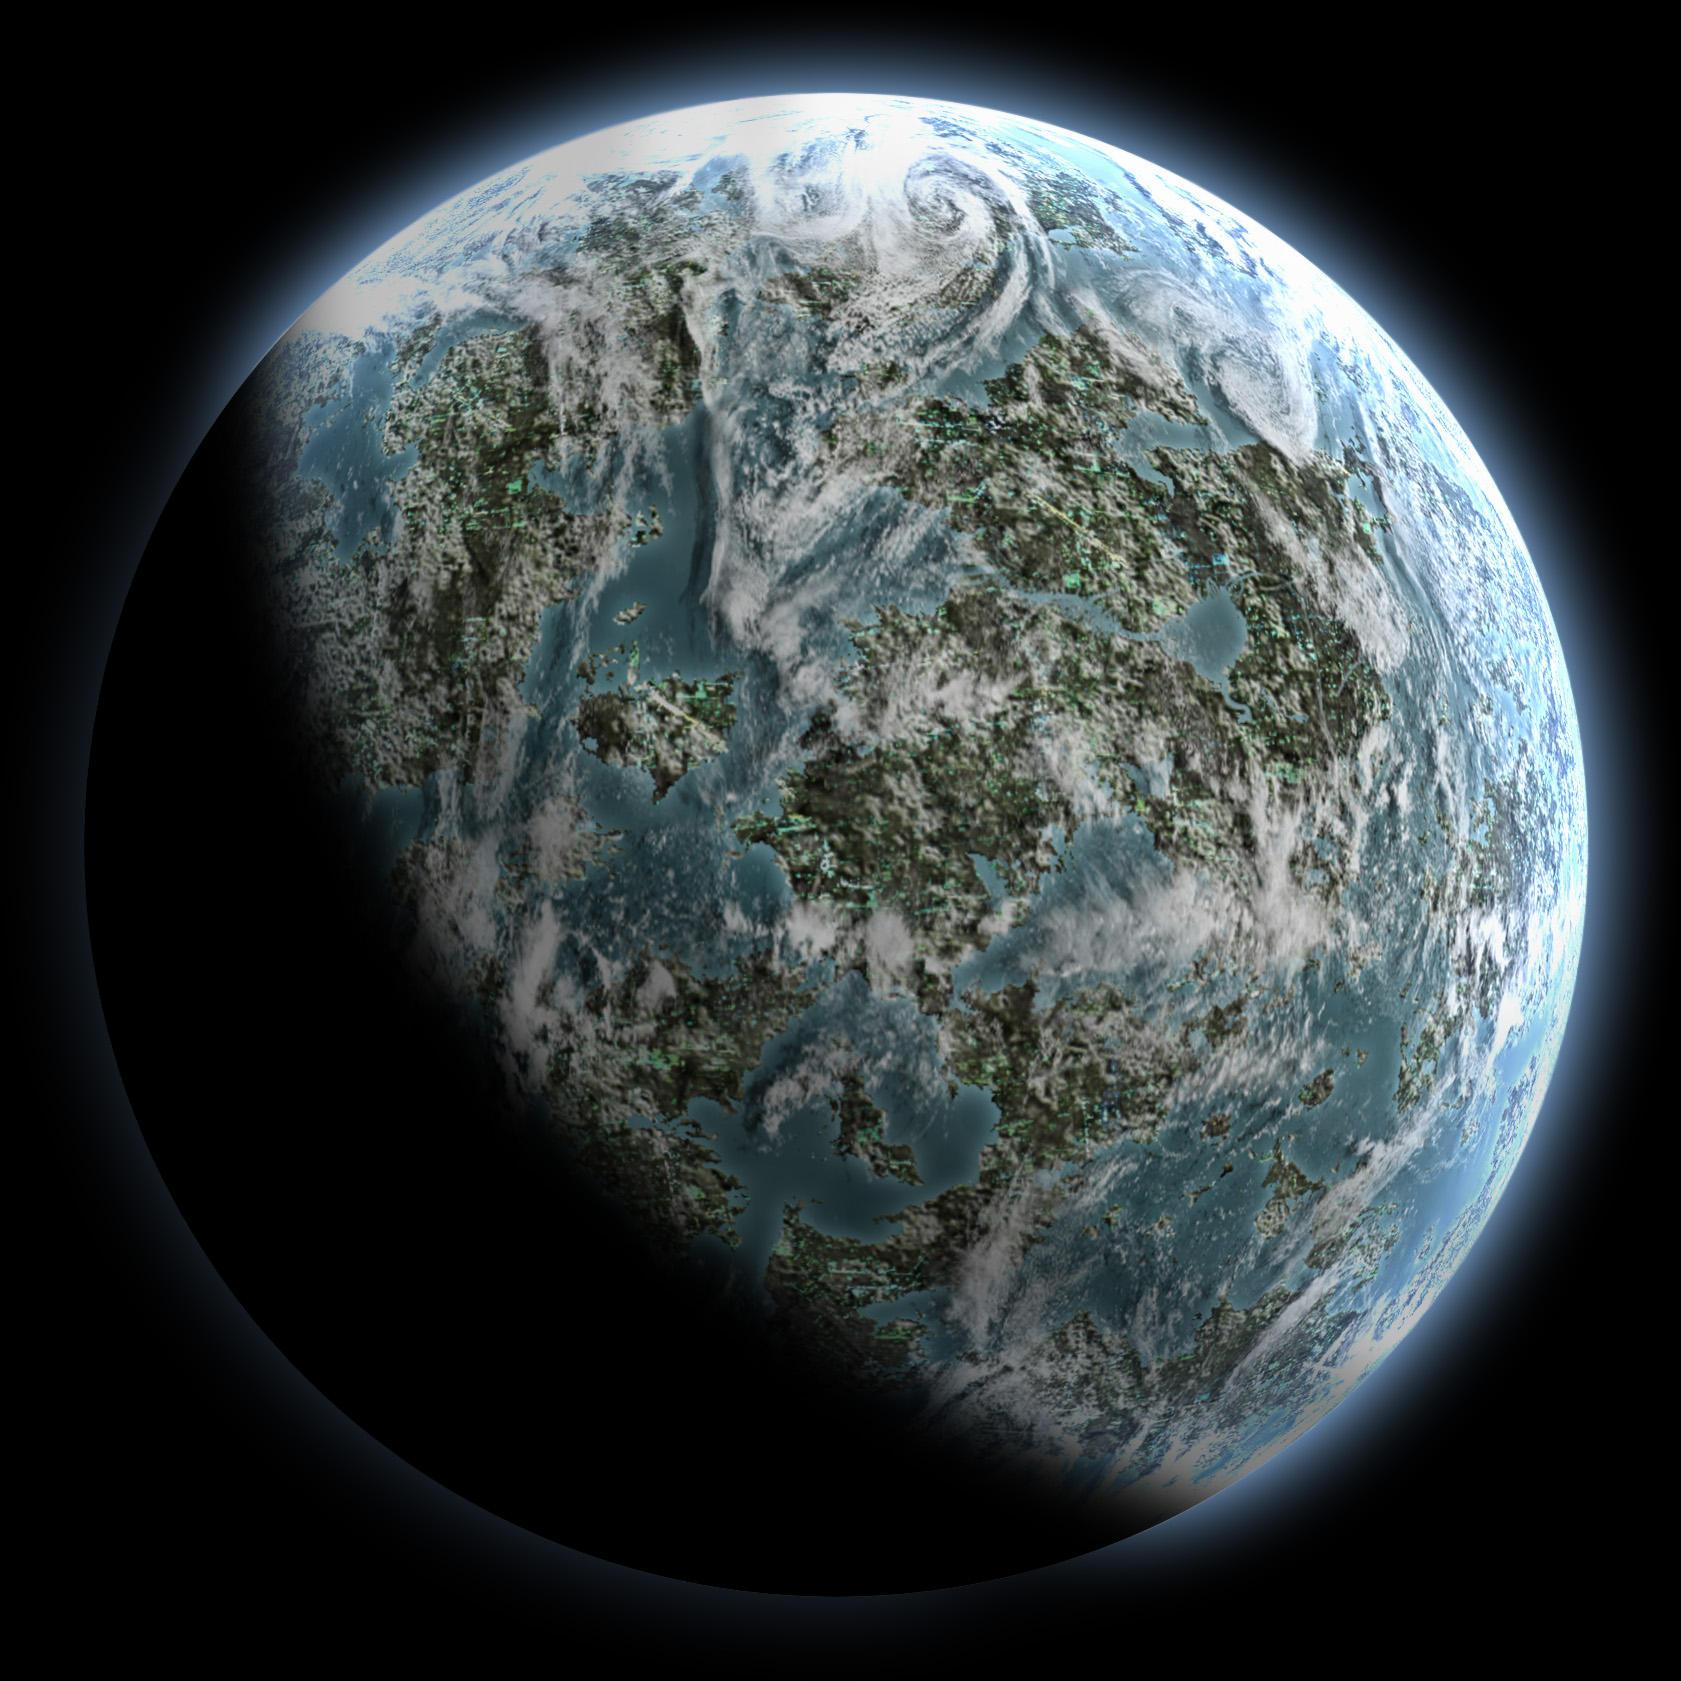 Planet resource 2 jungle by alpha leader on deviantart - Plante jungle ...